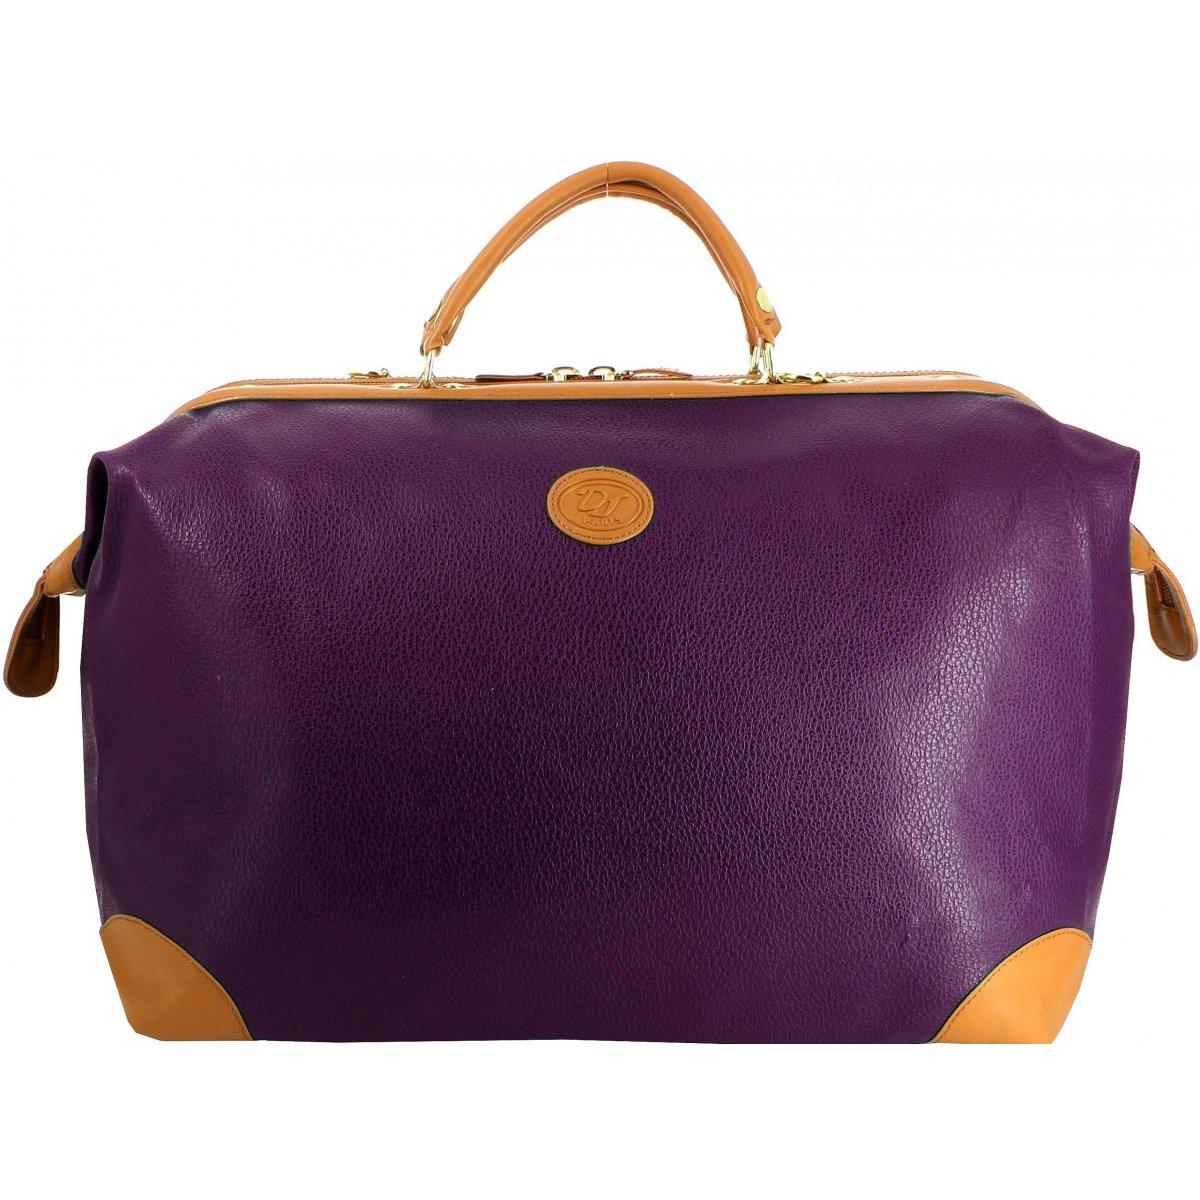 sac de voyage 48h david jones 77773c couleur violet promotion. Black Bedroom Furniture Sets. Home Design Ideas